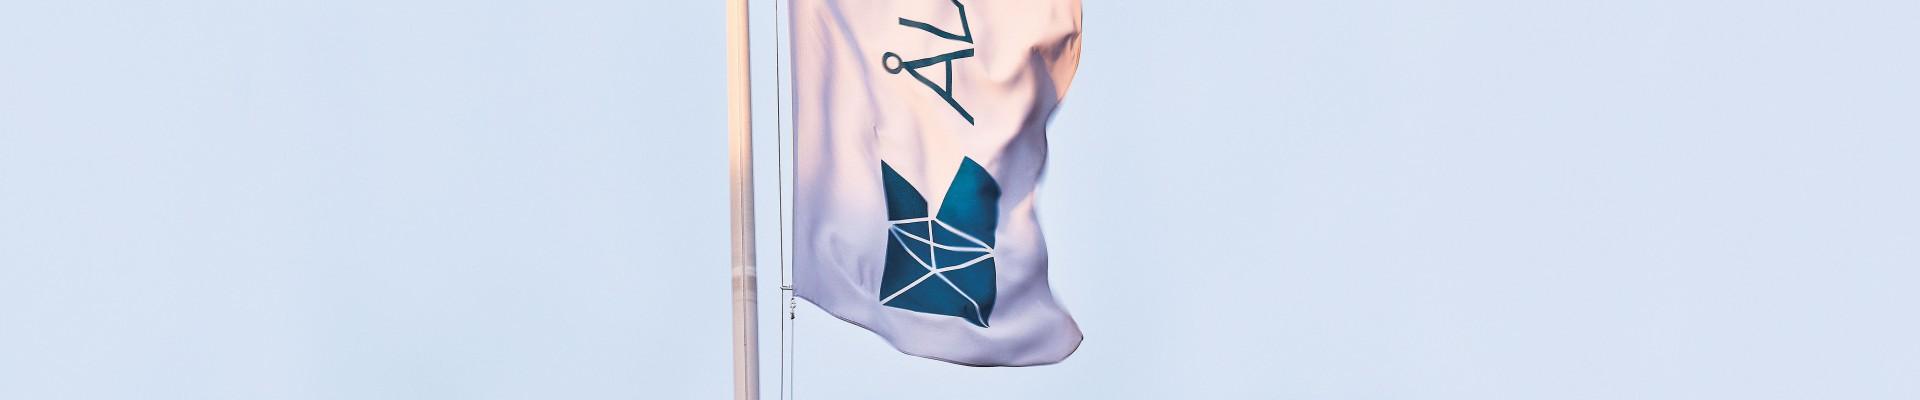 Åland Post lippu